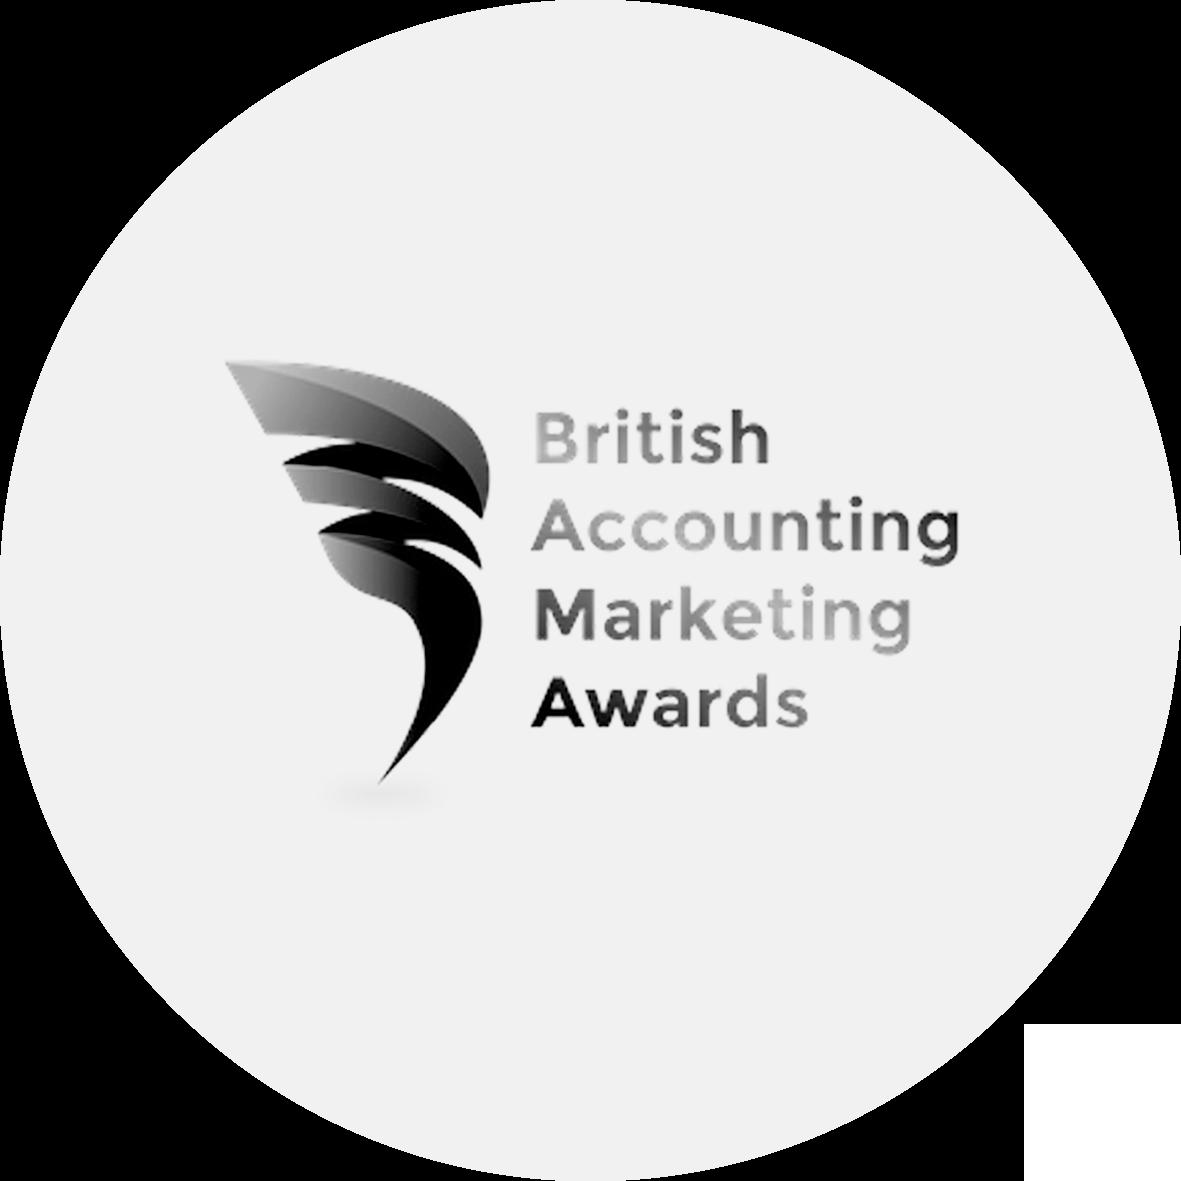 British Accounting Marketing Awards